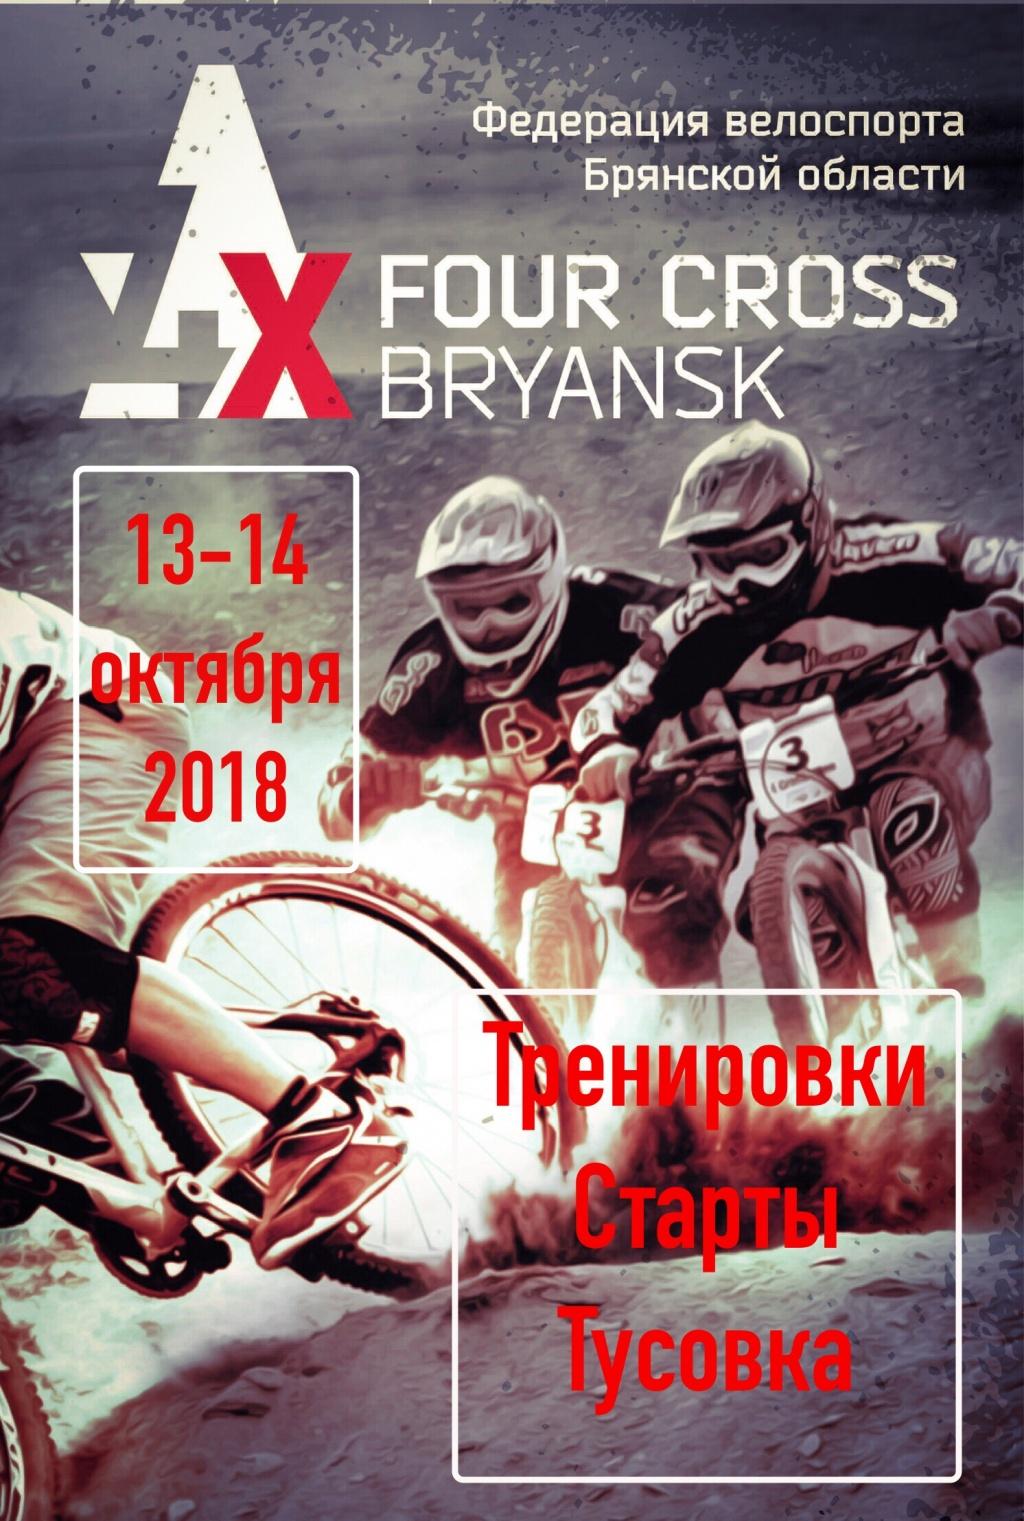 FunRide team: 4x, мы готовы! 13-14 октября 2018